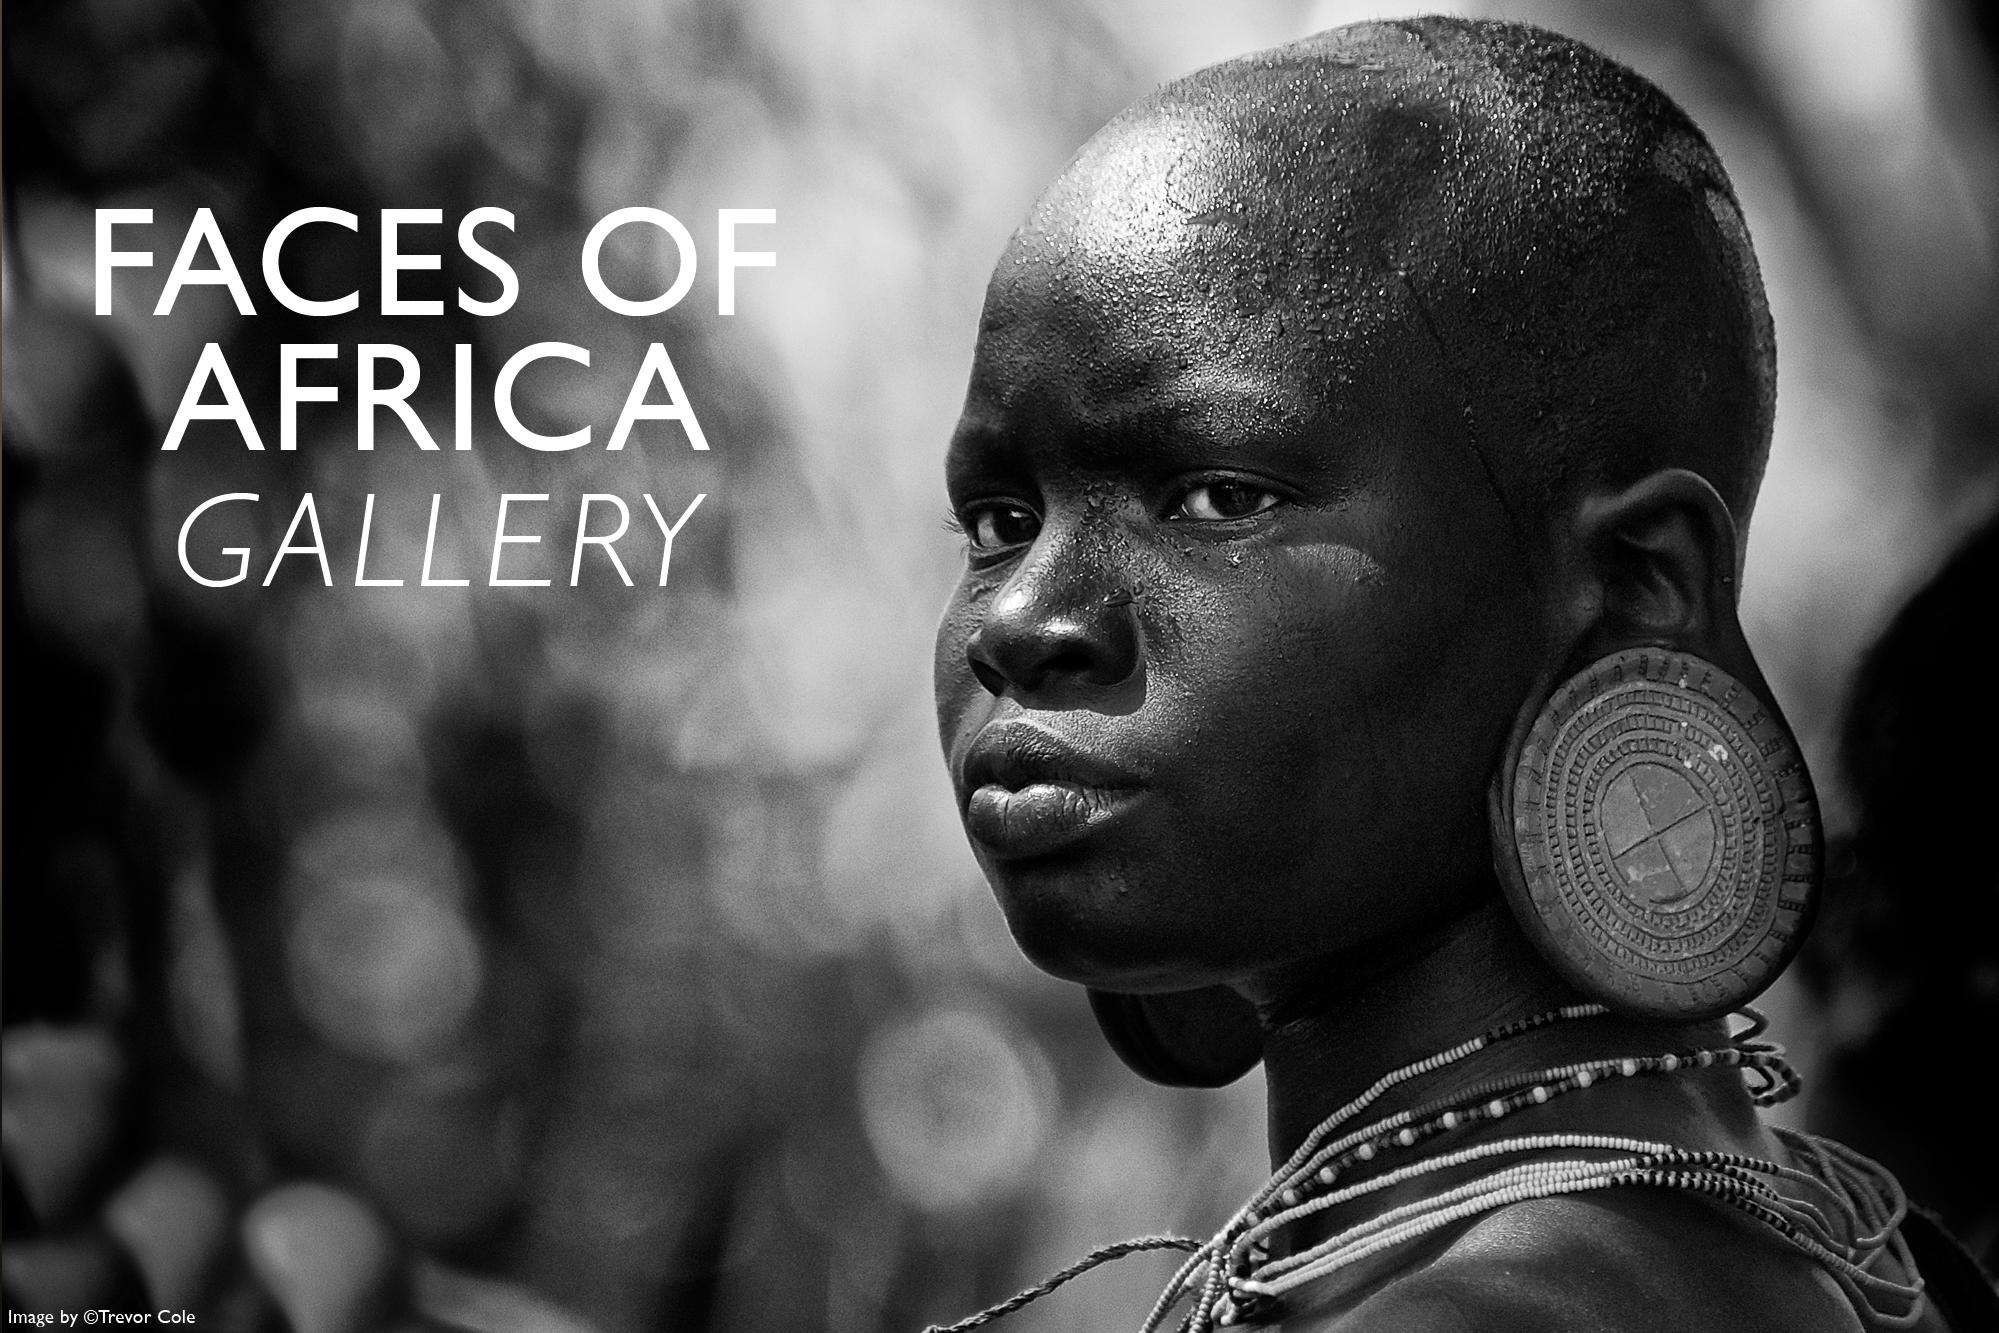 SOURCE: Africa Geographic magazine